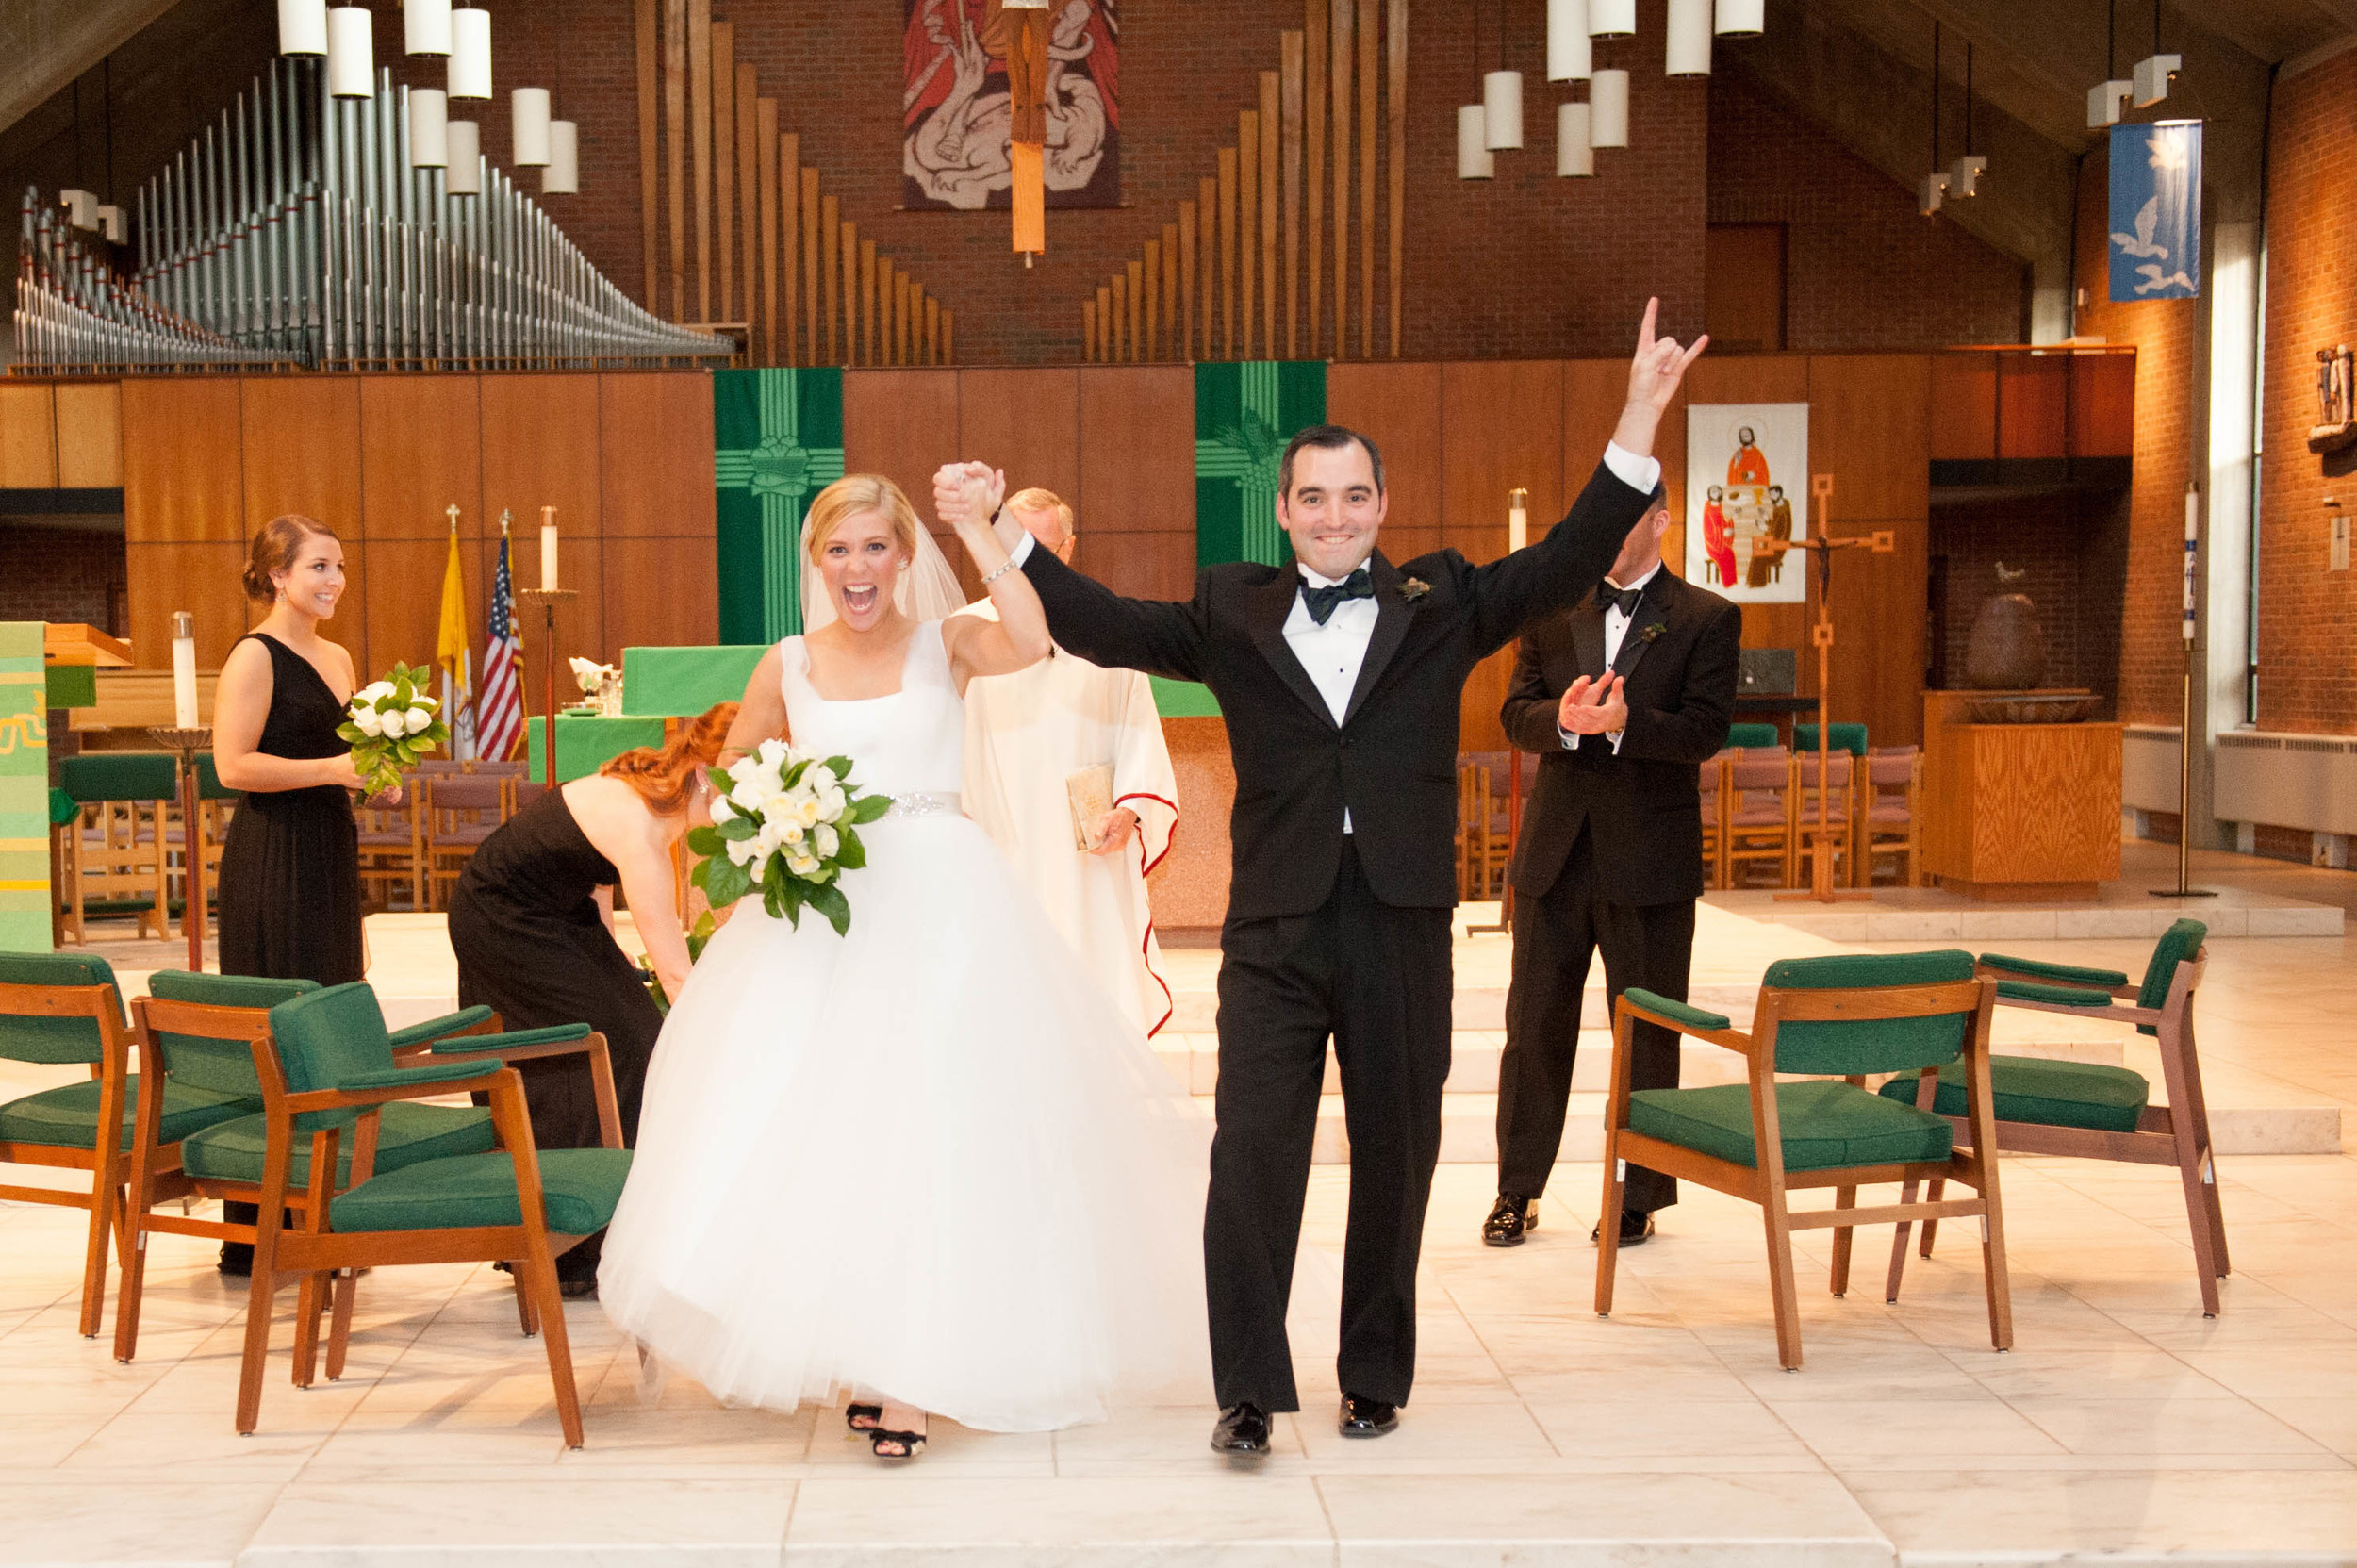 The_Ponds_Vermont_Wedding_Photo-19.jpg